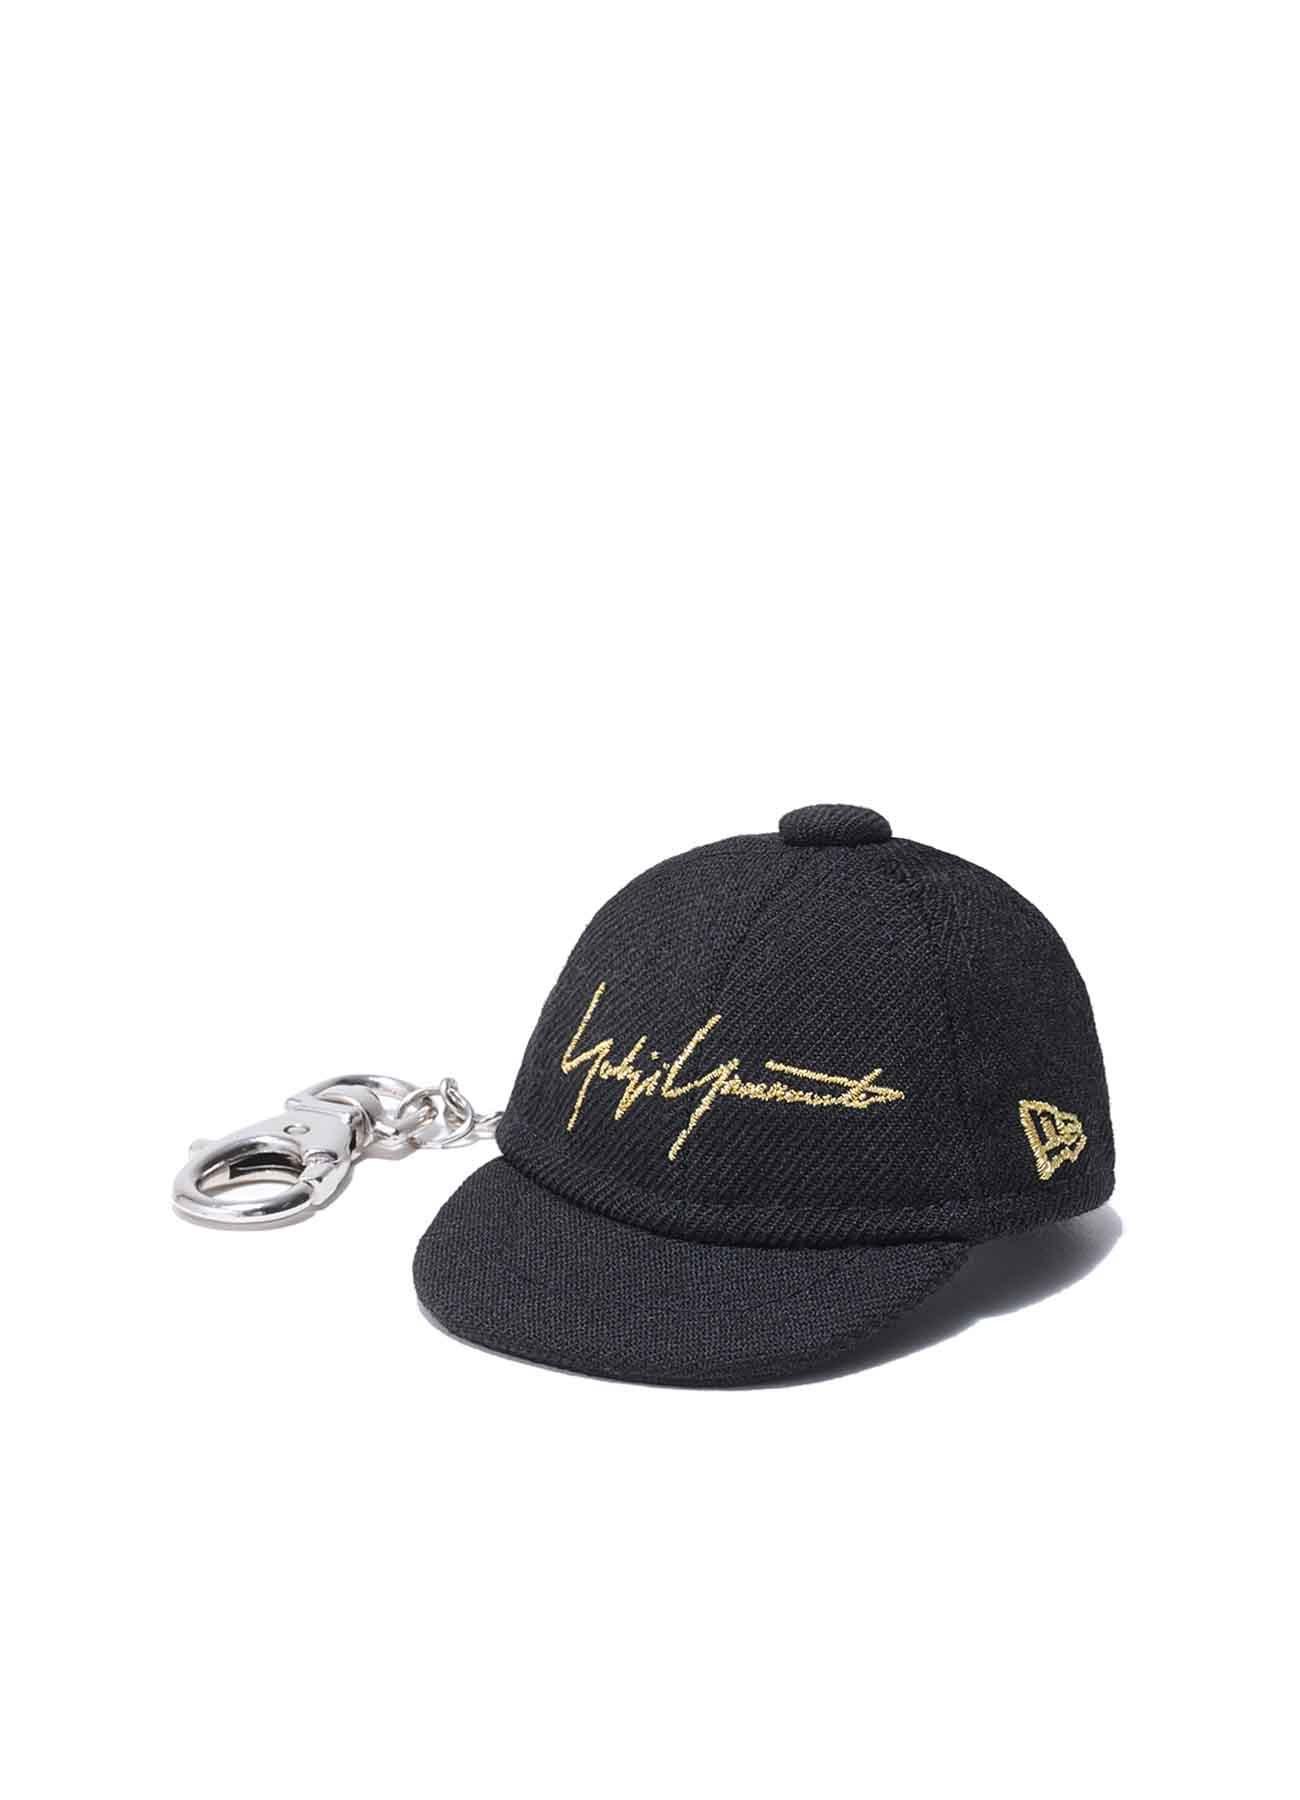 Yohji Yamamoto × New Era METALLIC GOLD SIGNATURE CAP KEY HOLDER